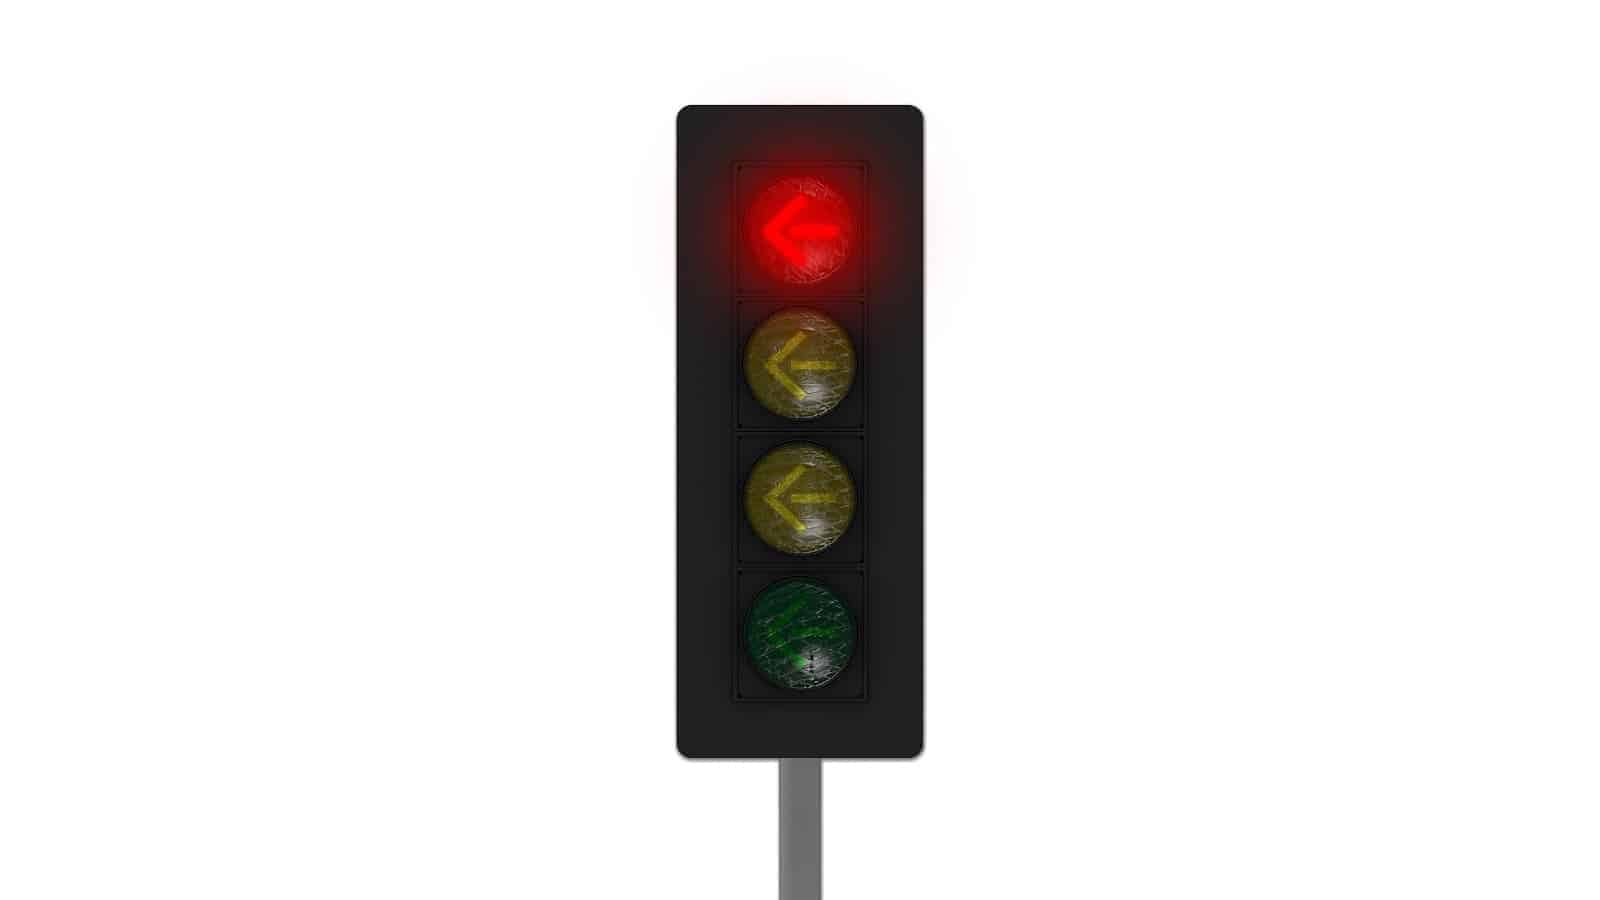 Traffic signals red arrow